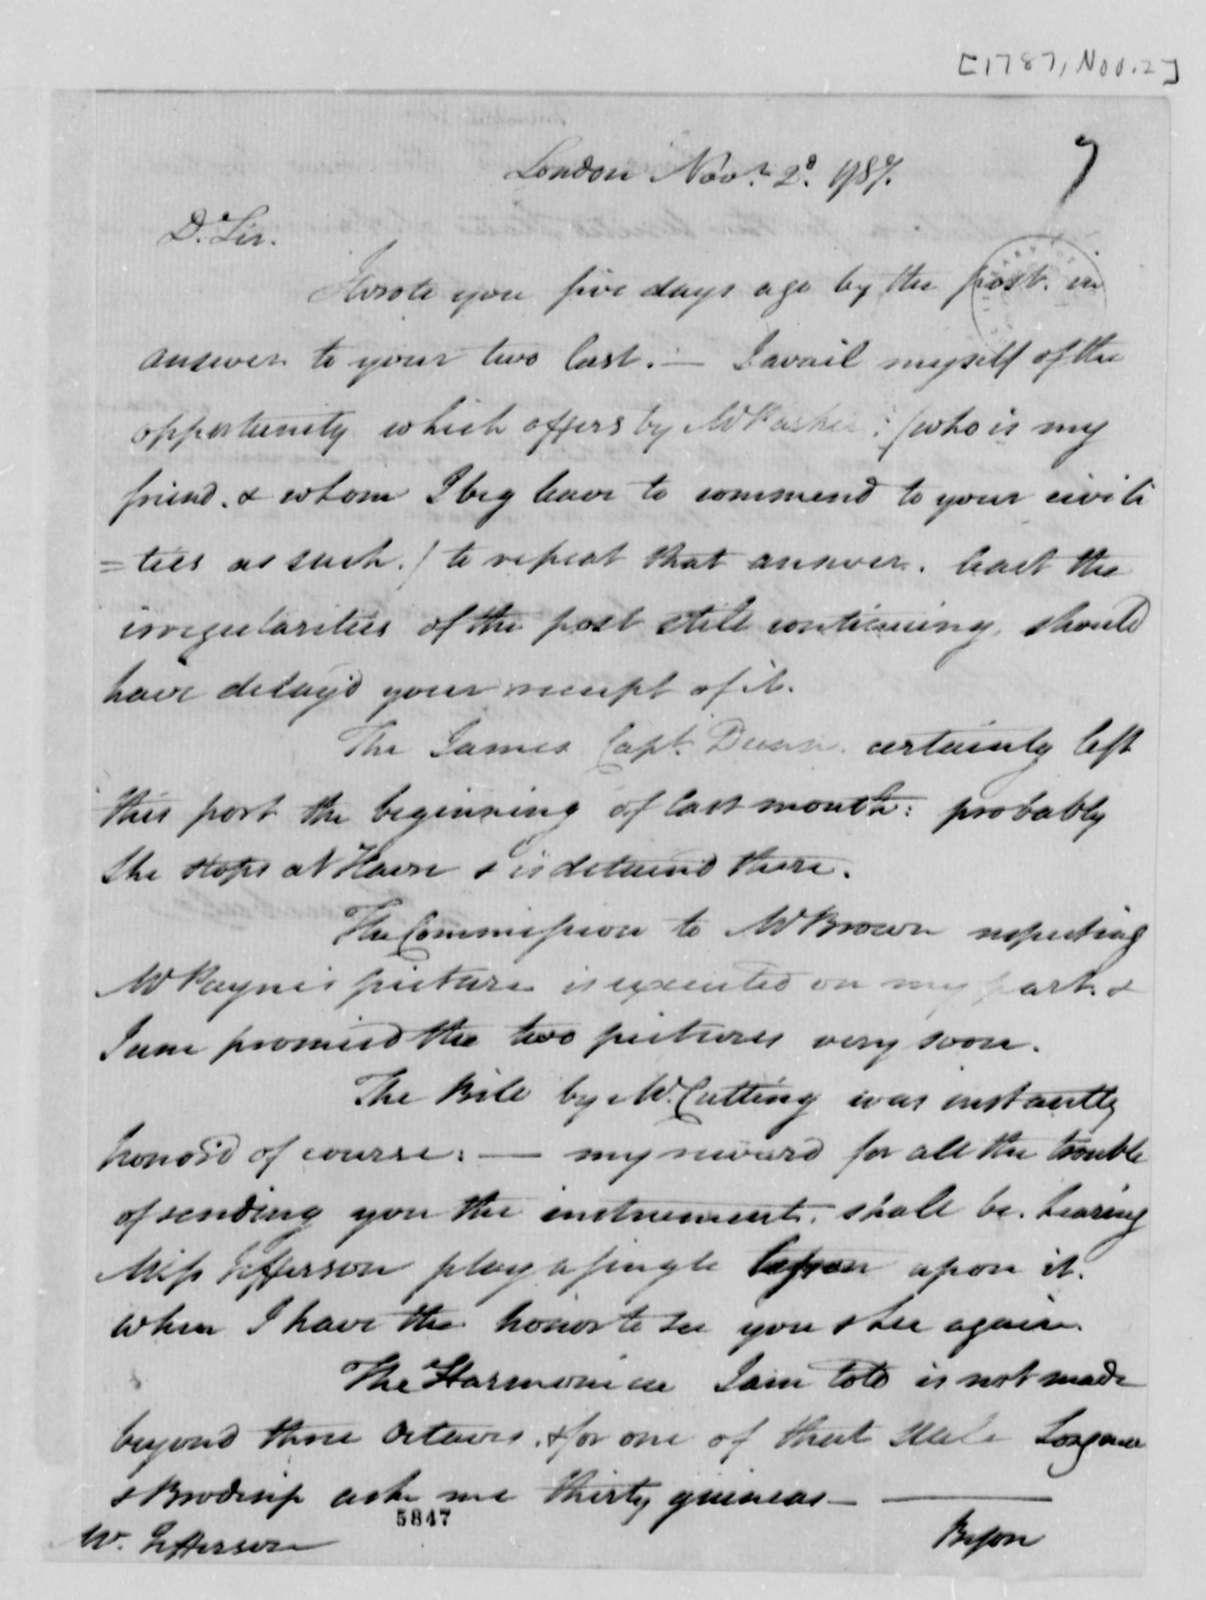 John Trumbull to Thomas Jefferson, November 2, 1787